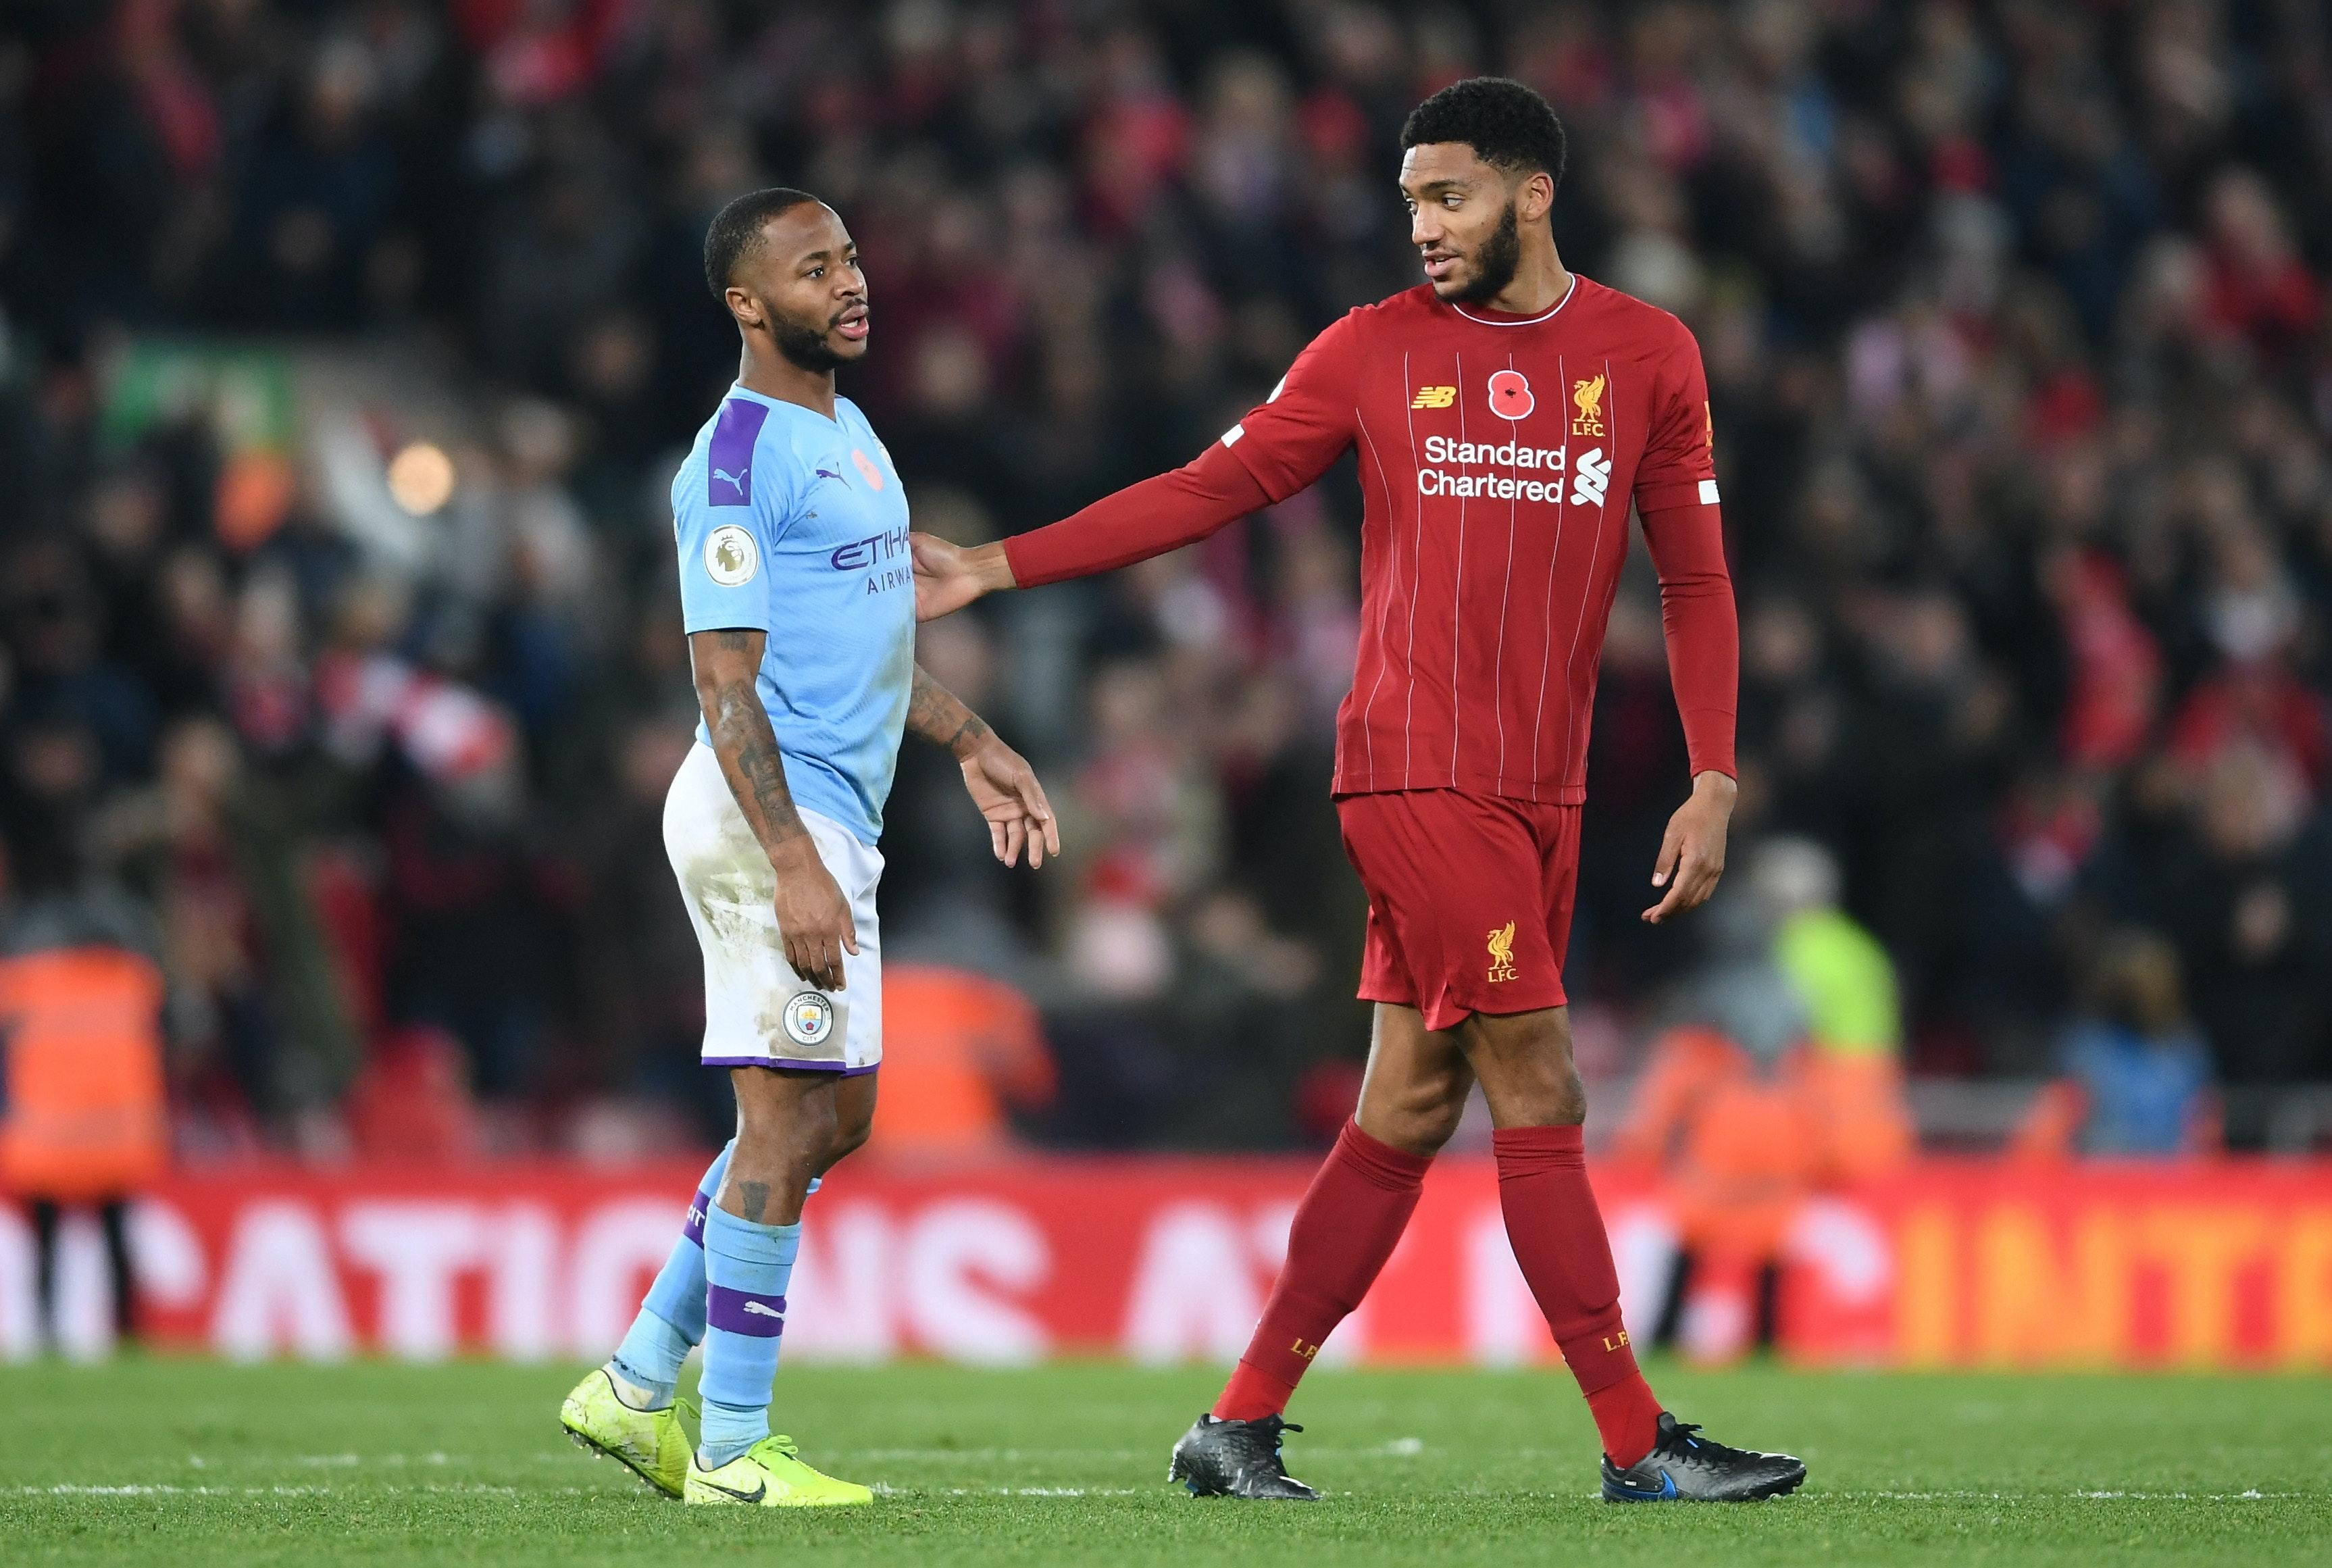 Gomez og Sterling måtte skilles på England-trening